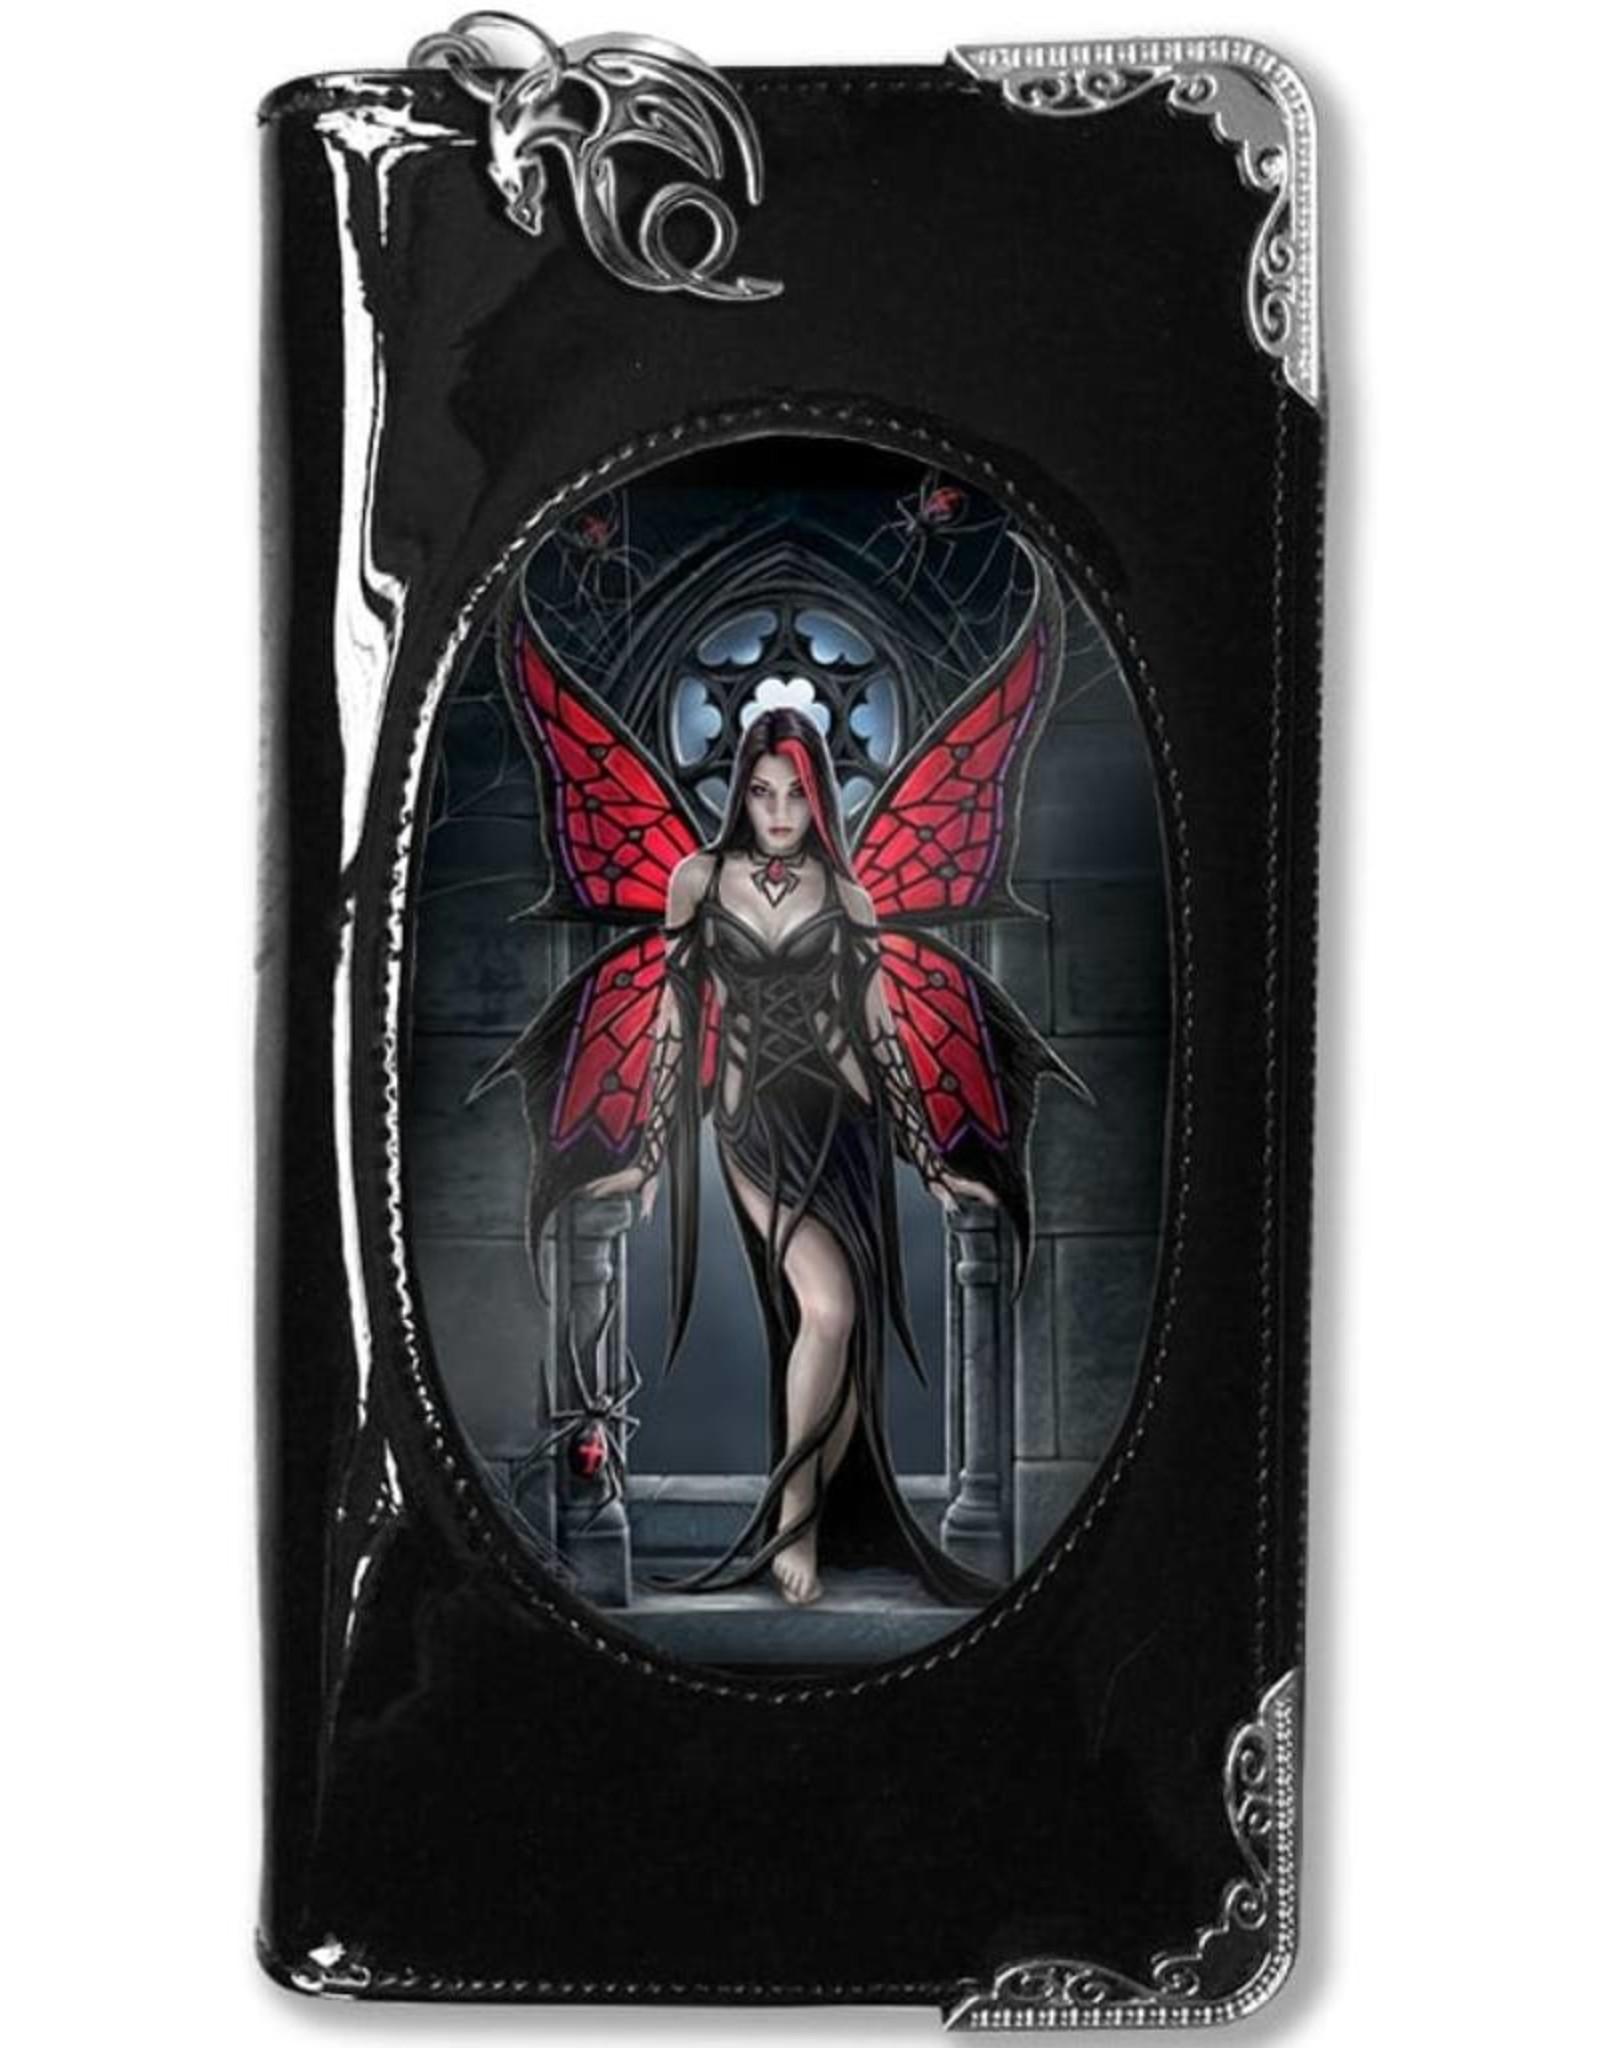 Anne Stokes Gothic wallets and purses - Anne Stokes 3D purse Aracnafaria (Gothic Fairy)